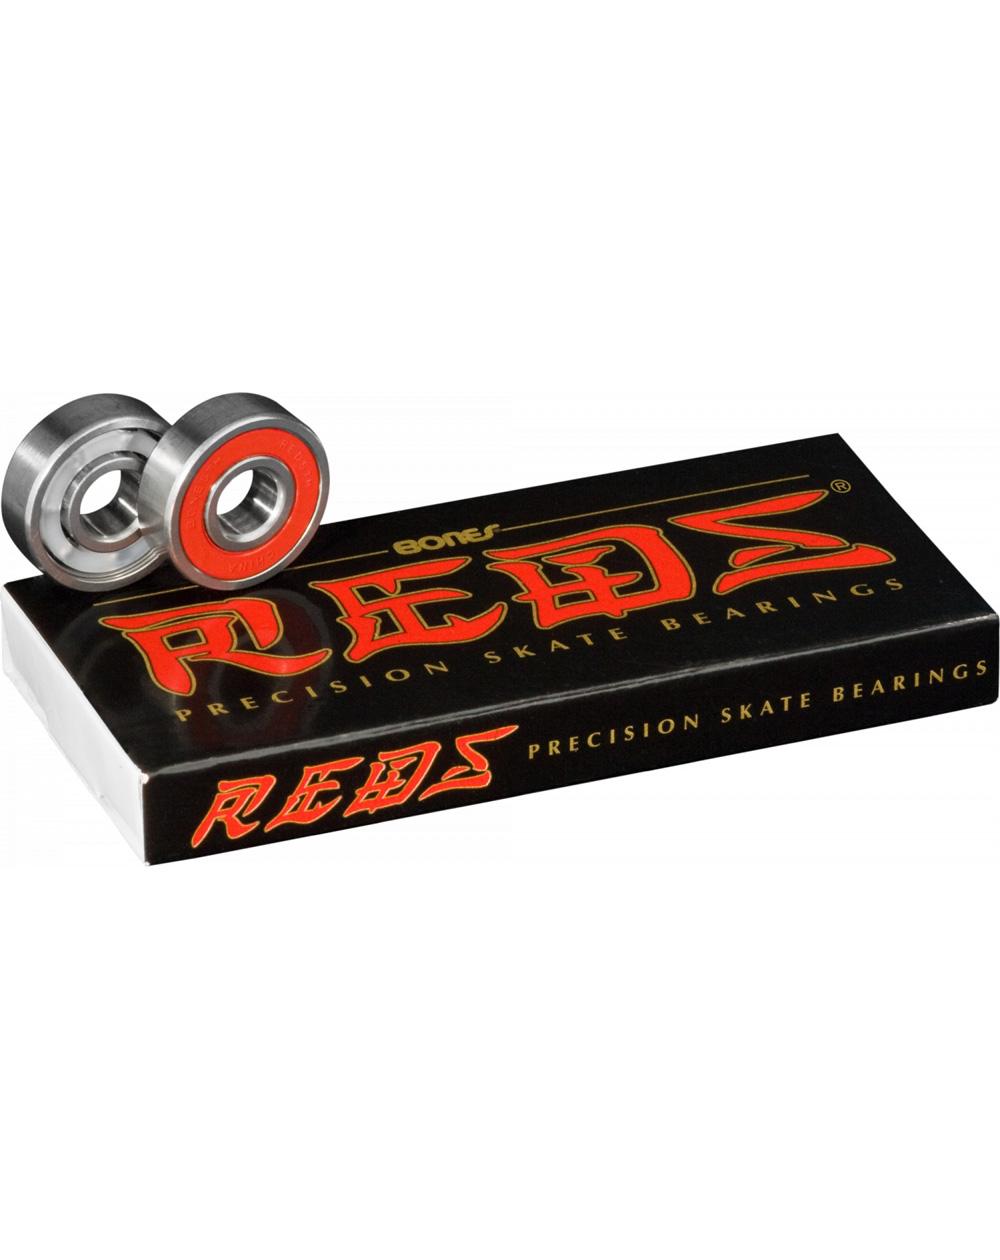 Bones Bearings Roulements Skateboard Reds